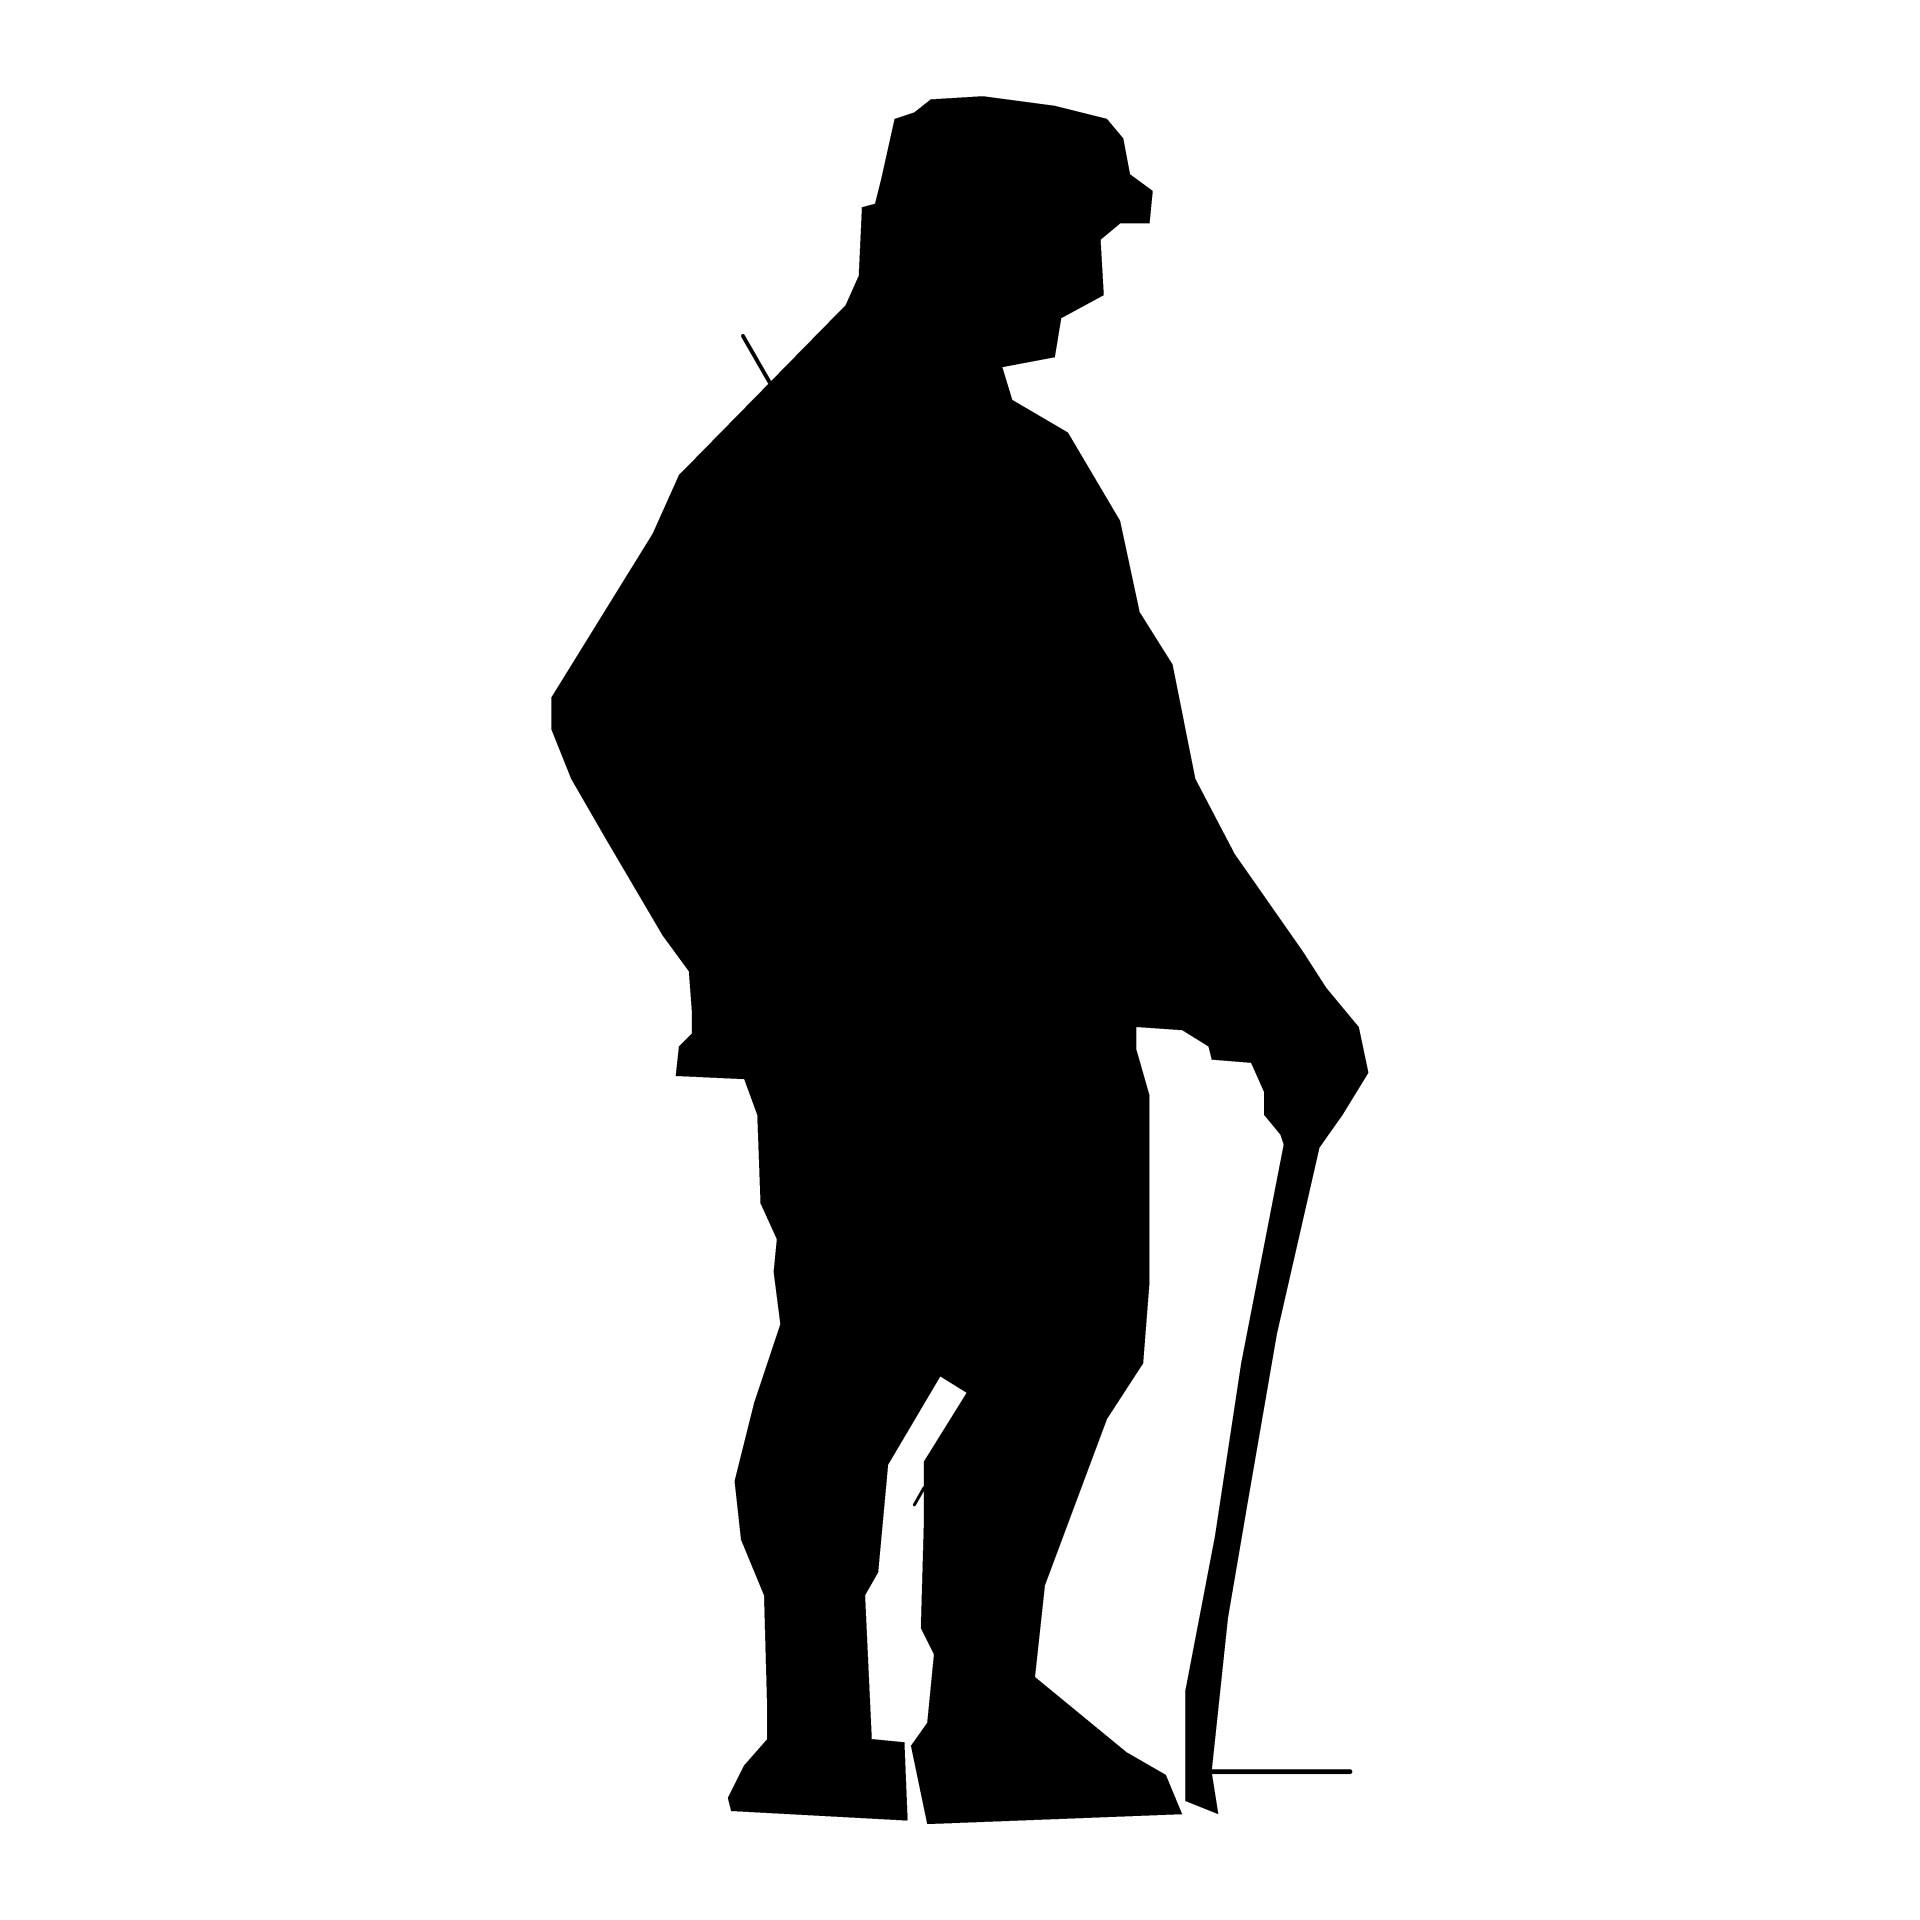 1920x1920 Silhouette Man Hiking Free Stock Photo